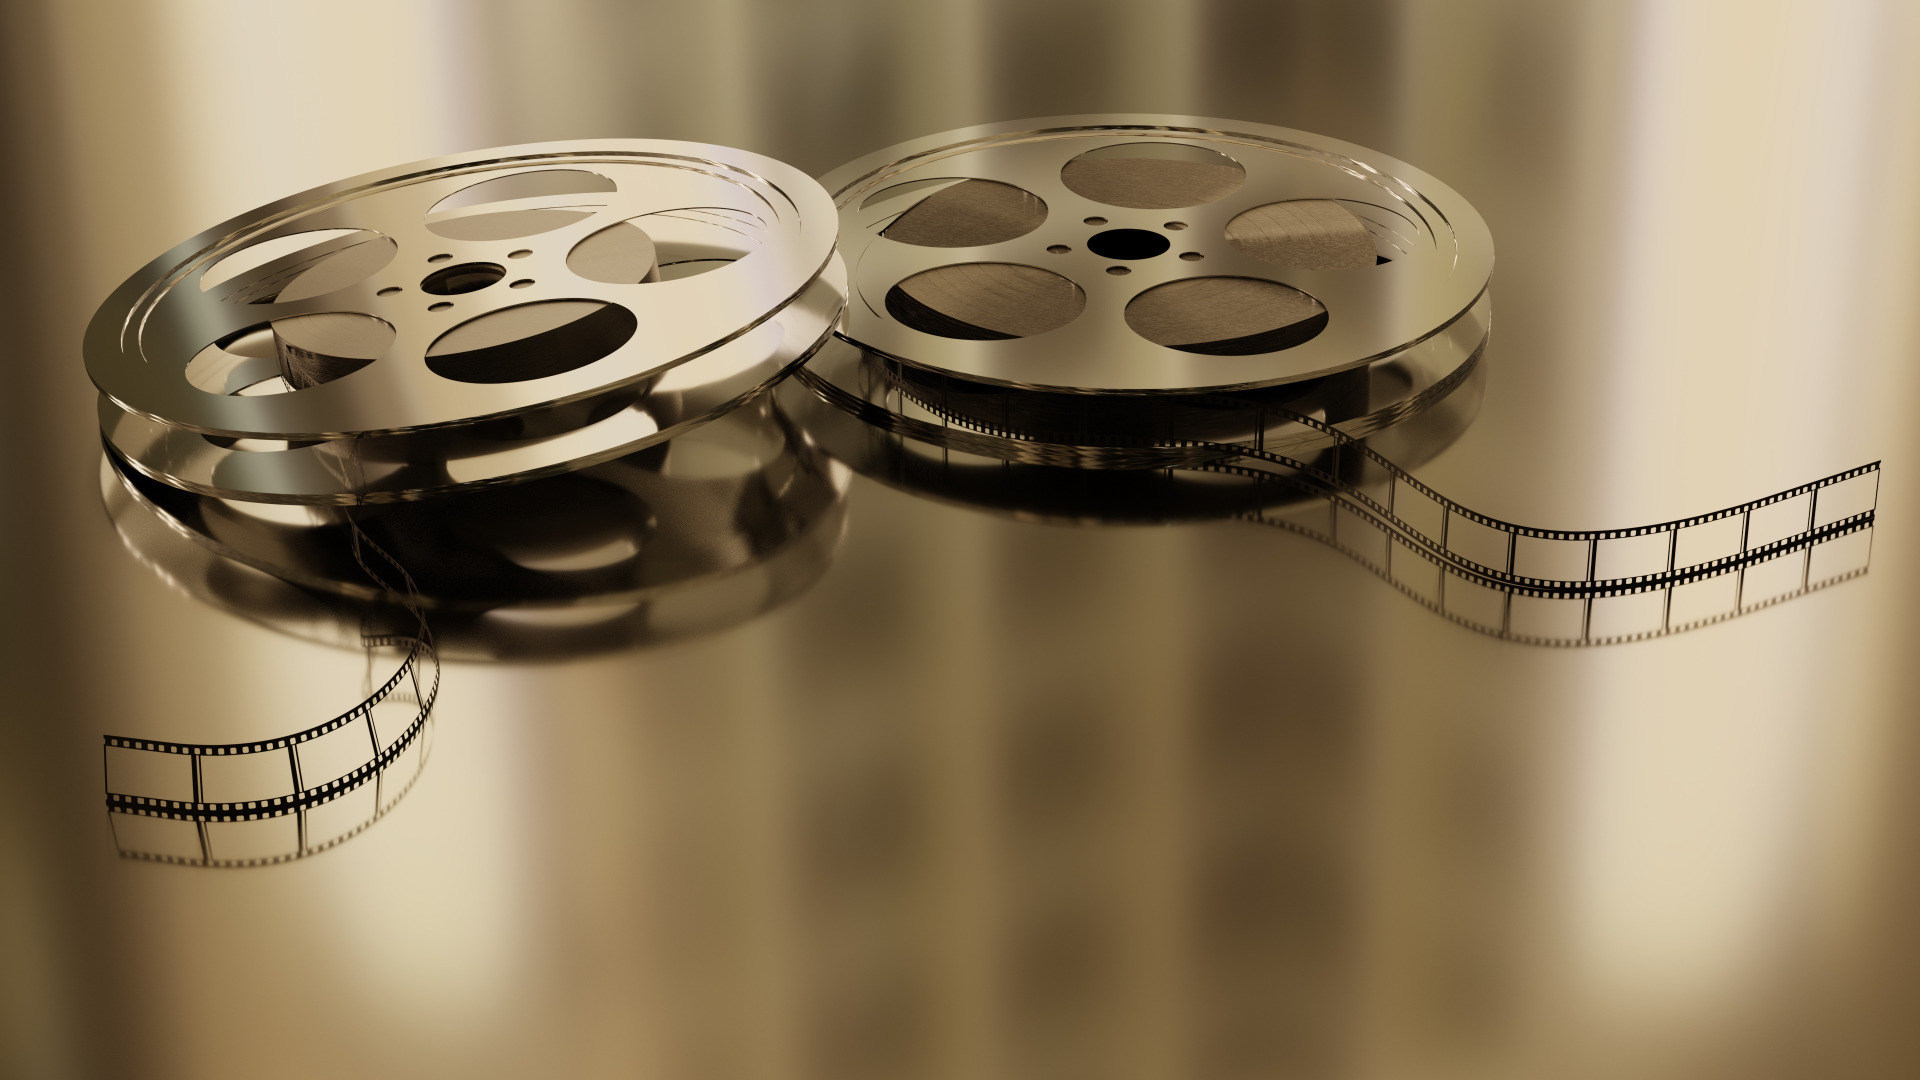 Film, Kino, Kinofilm, Filmrolle